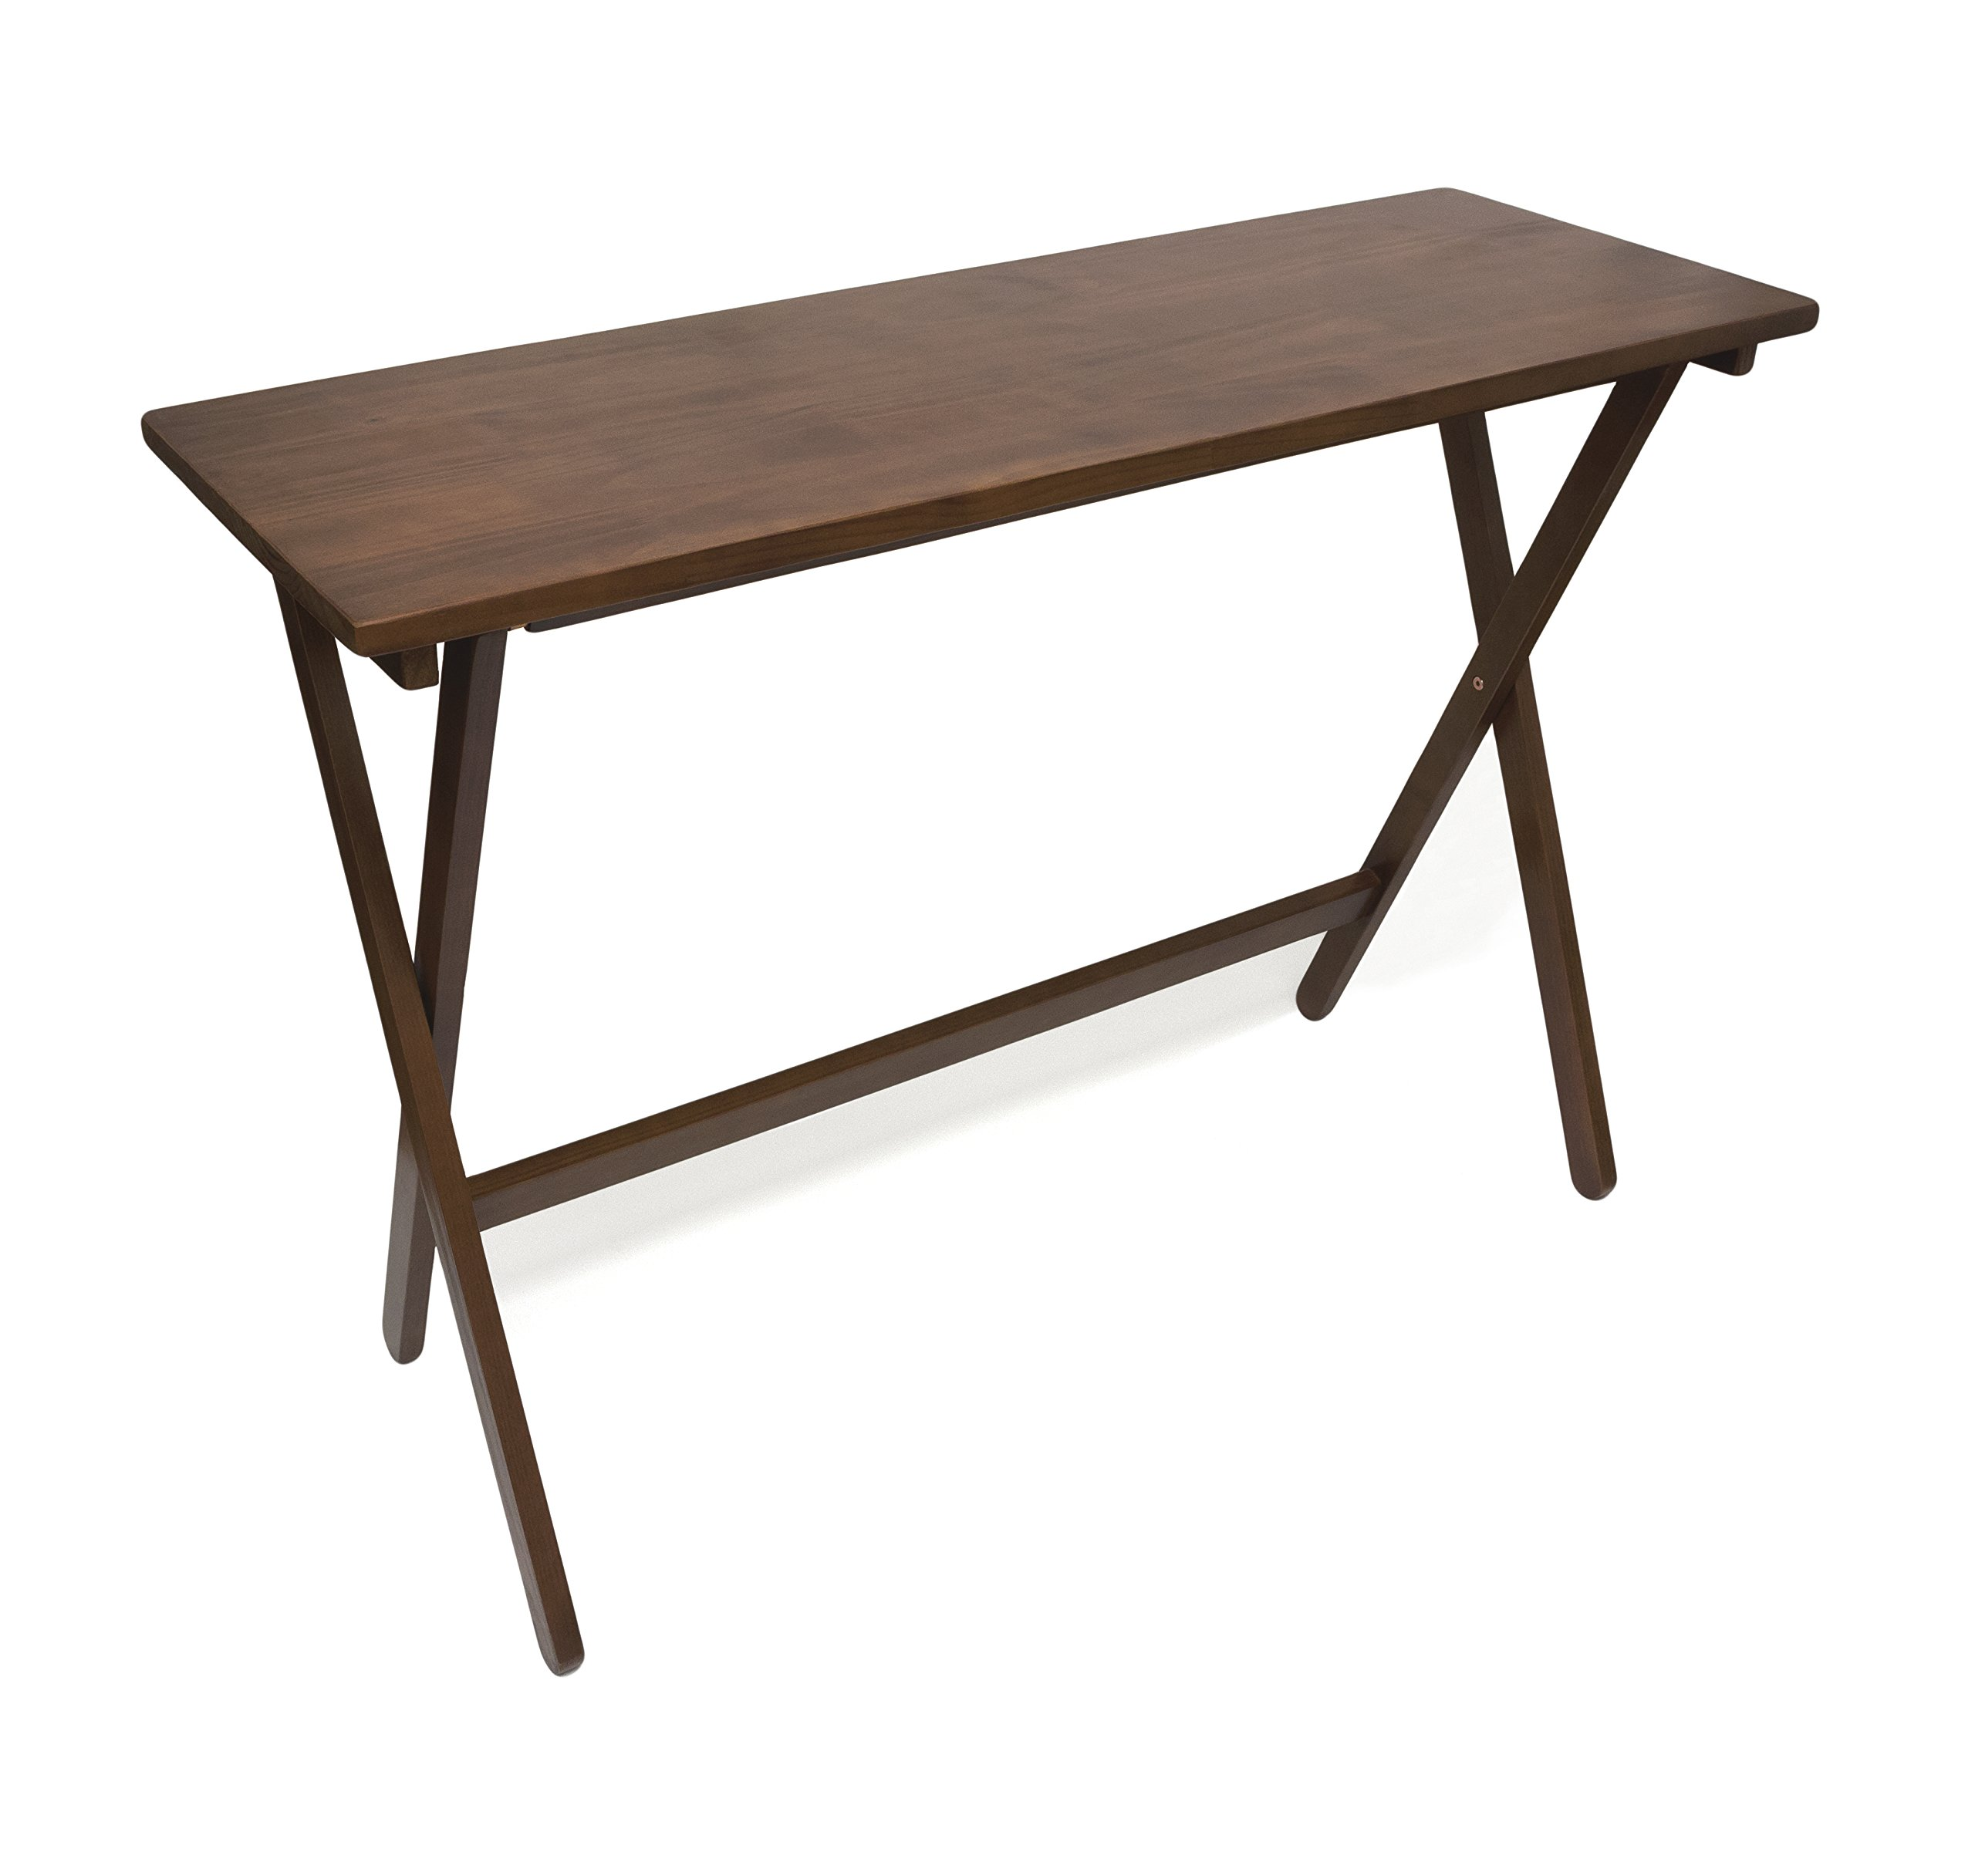 Lipper International 503WN Folding Buffet Table, Brazilian Pinewood with Walnut Finish, 42'' x 15.25'' x 29.75'' by Lipper International